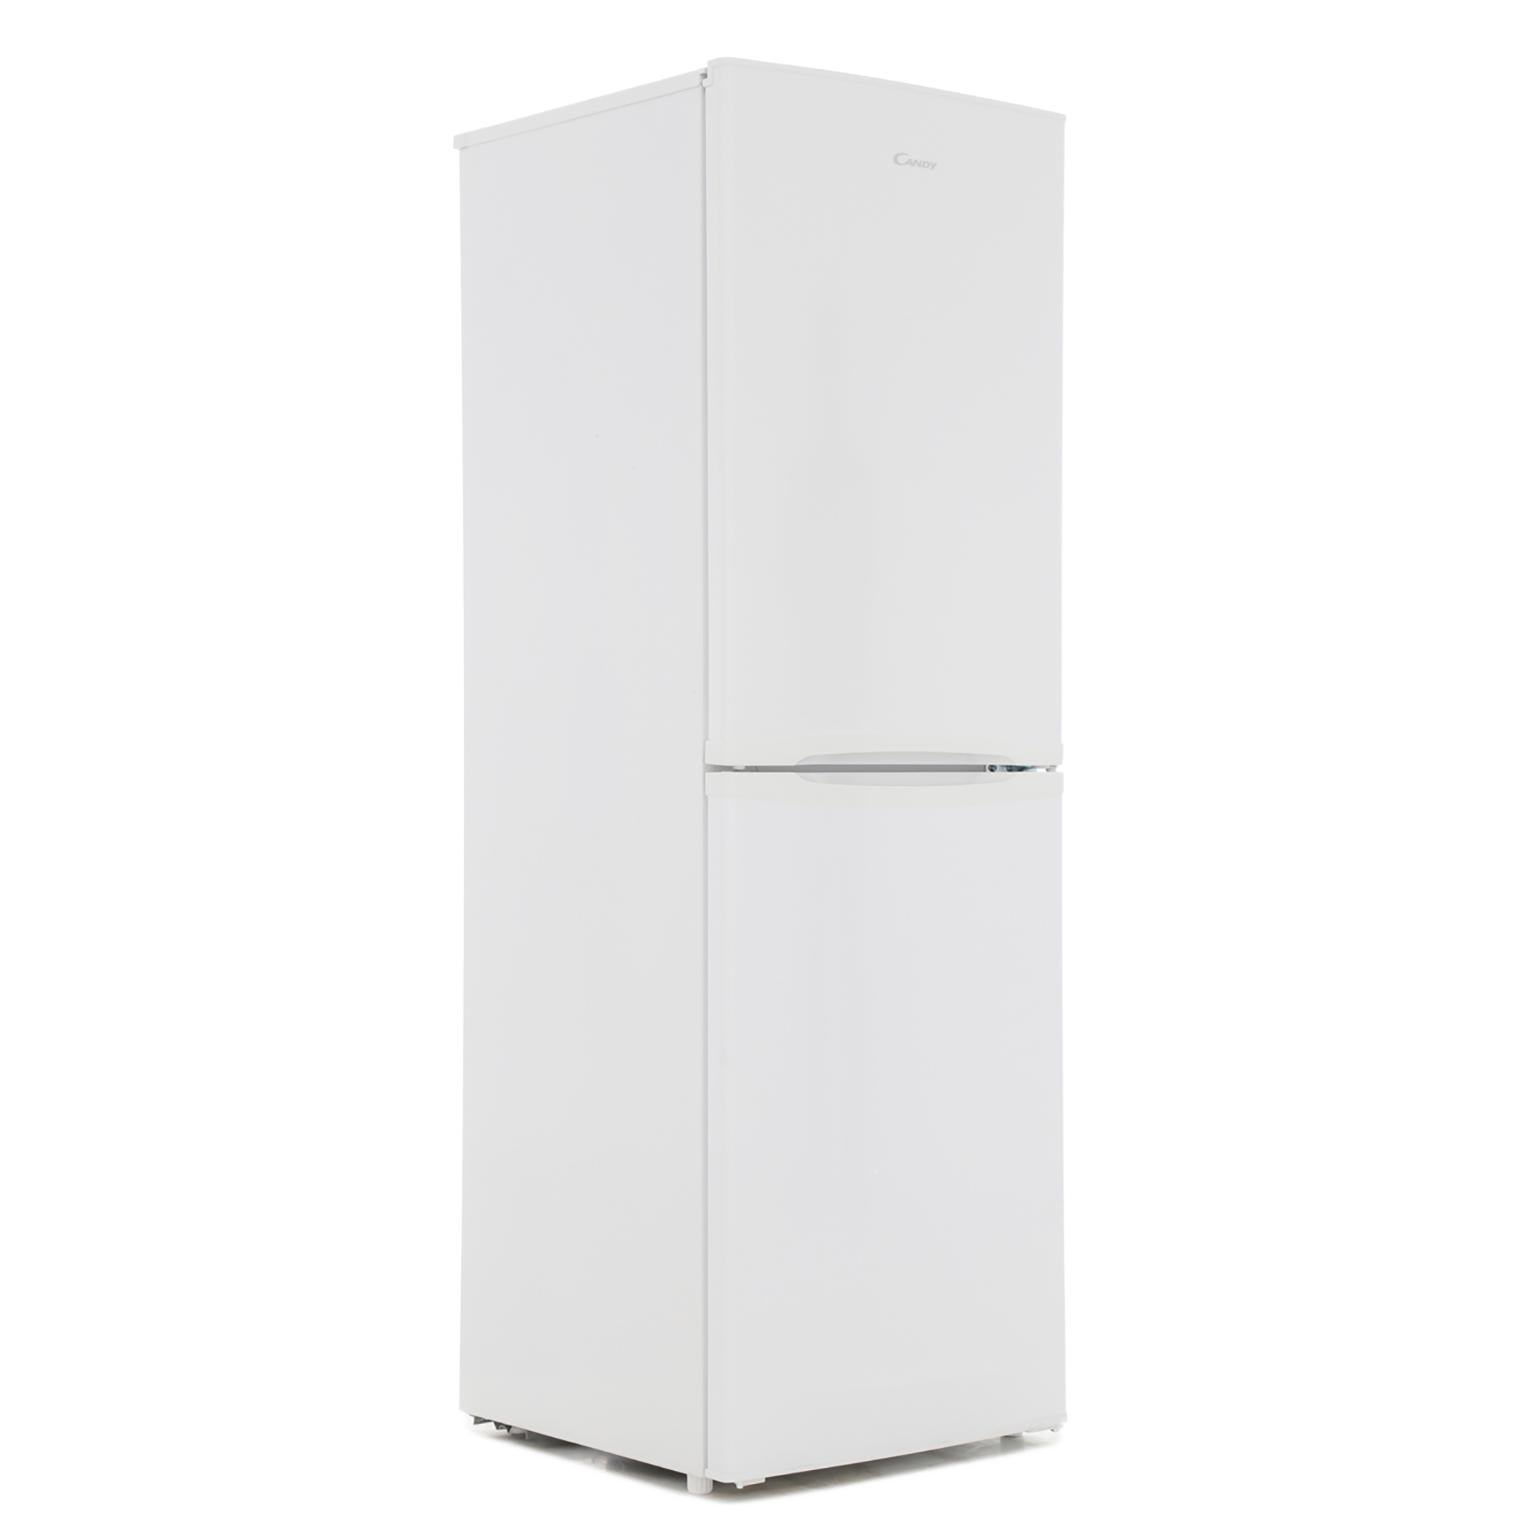 Candy CSS5166WE Fridge Freezer